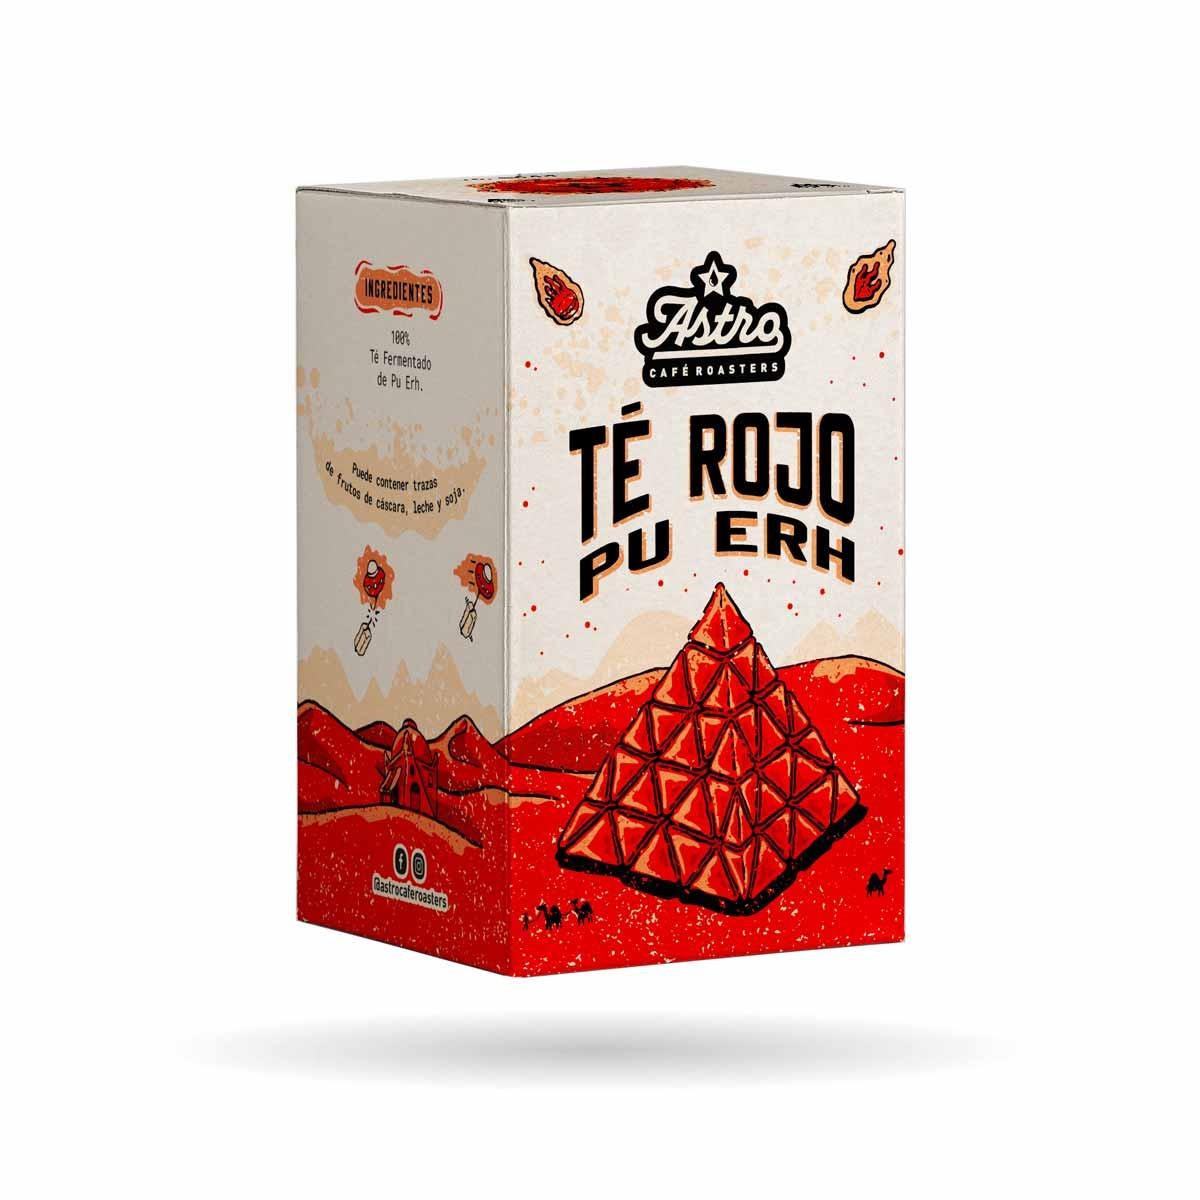 Te Rojo Astro Cafe